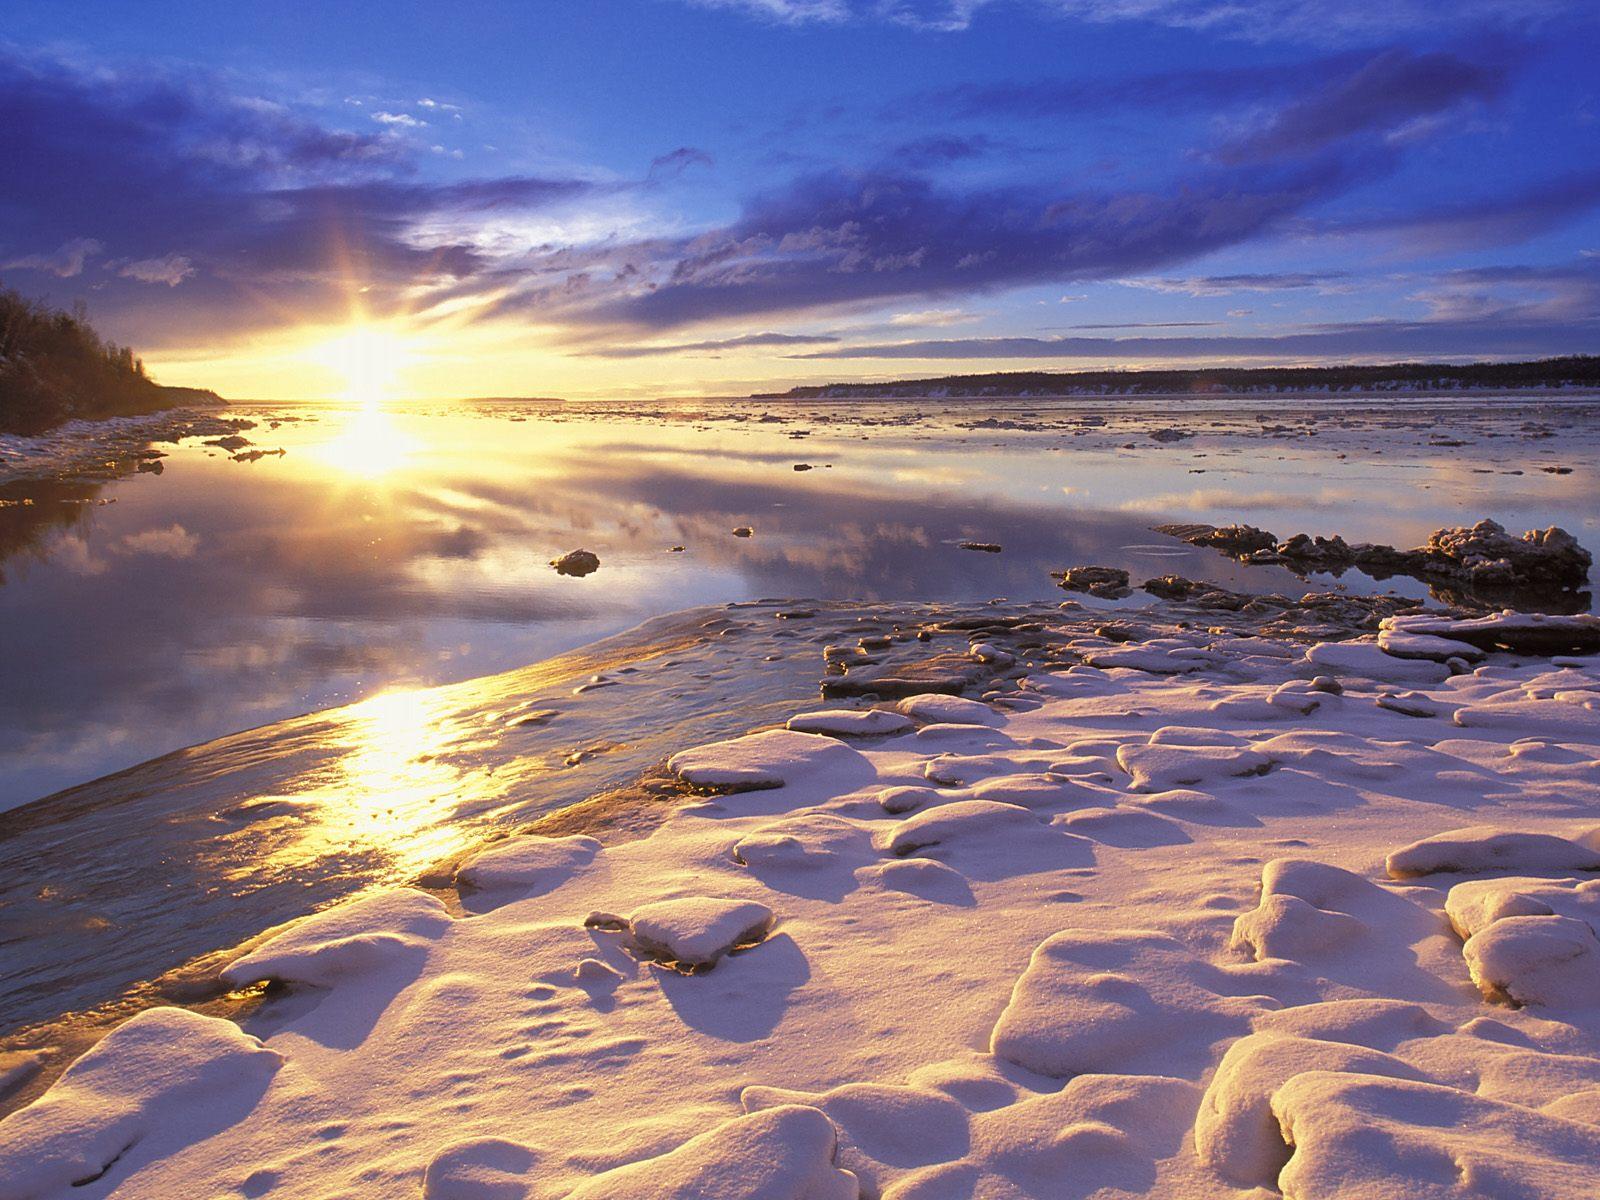 Alaska'da gün batımı